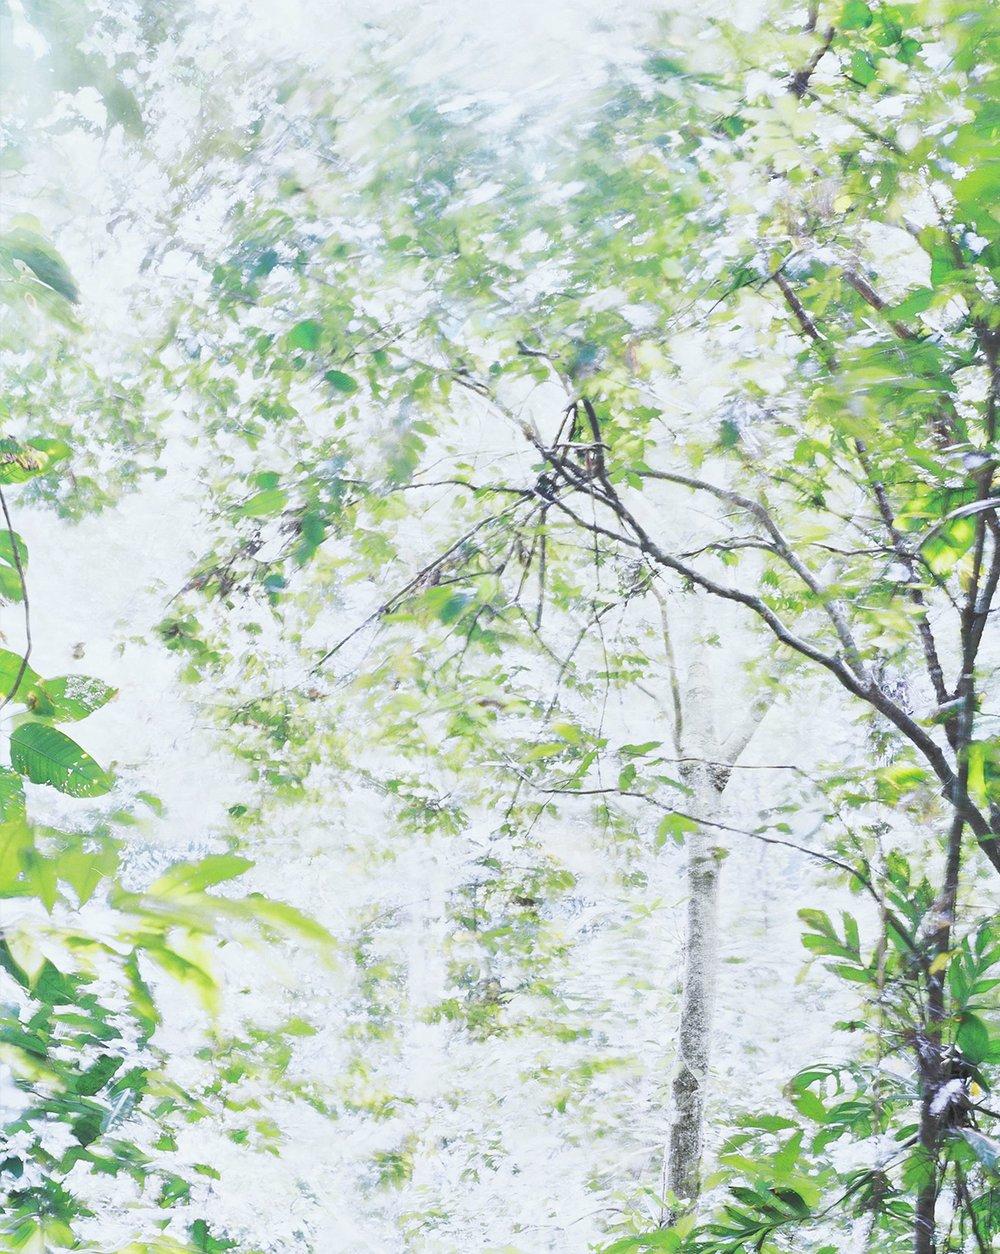 Respiro 05, 2017 37.5 x 30 in Vellum + Archival Inkjet Prints Overlaid